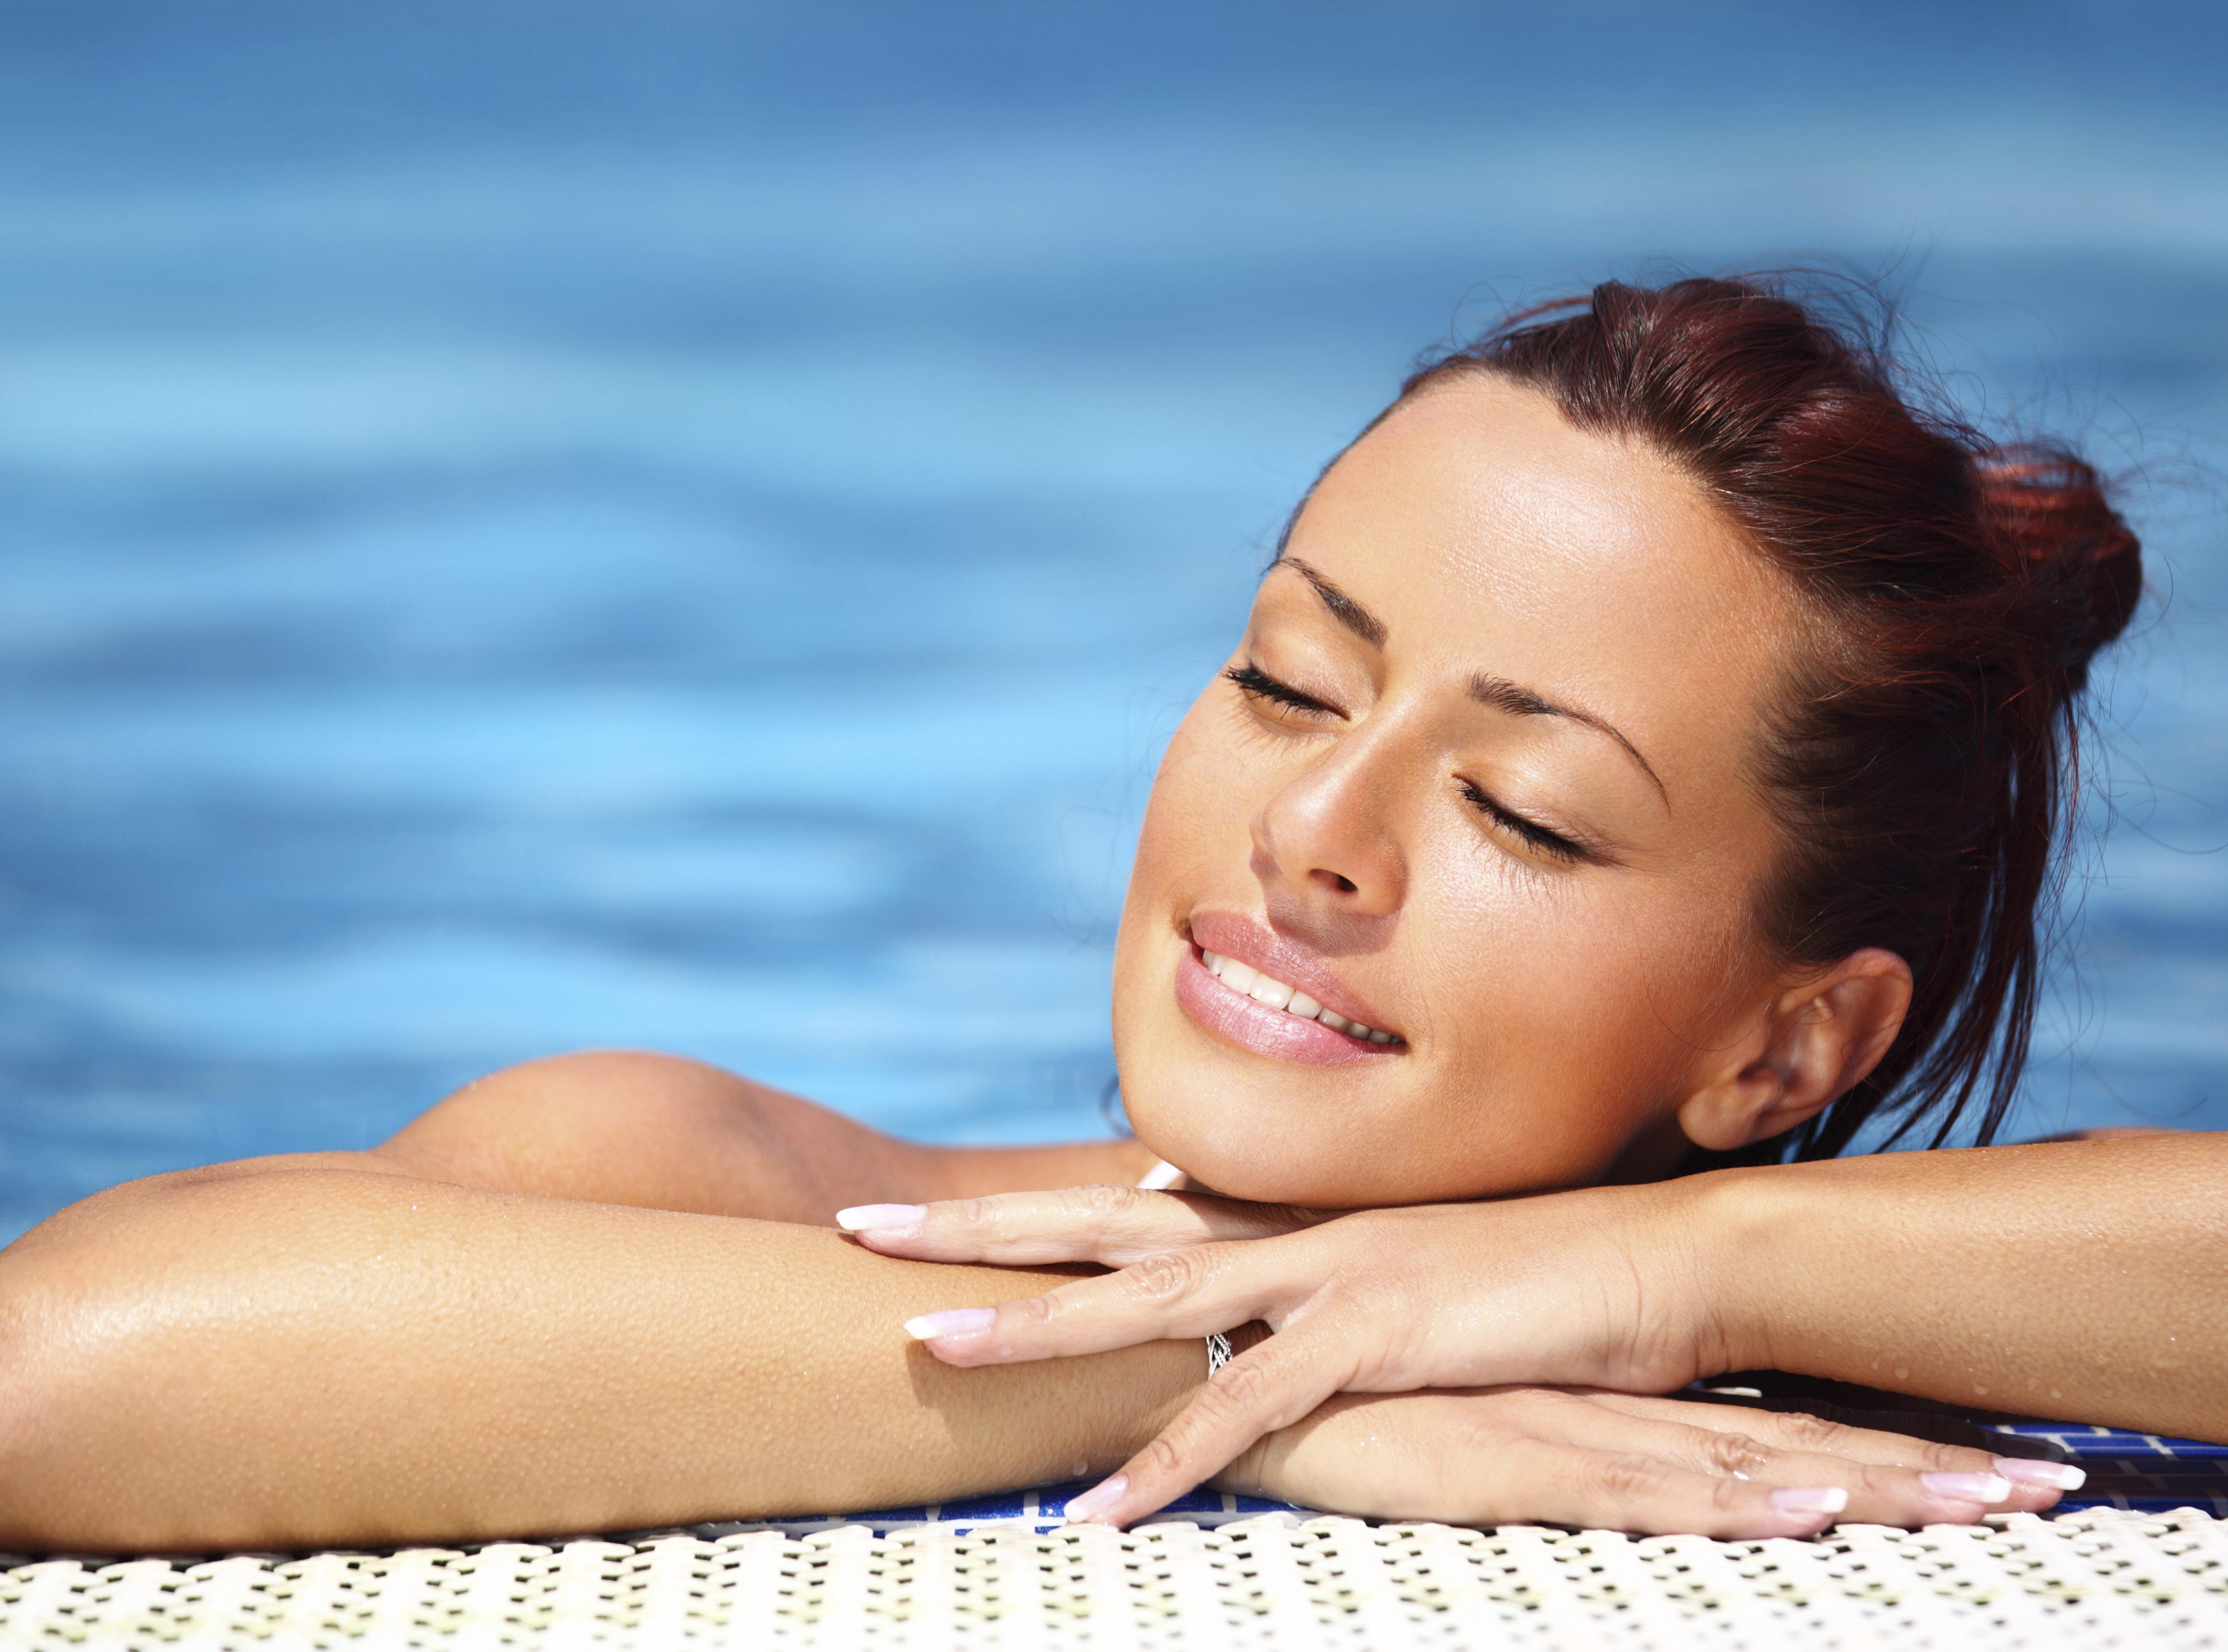 summer skin care tips derma roller Lepa i zdrava: Nega lica u letnjem periodu